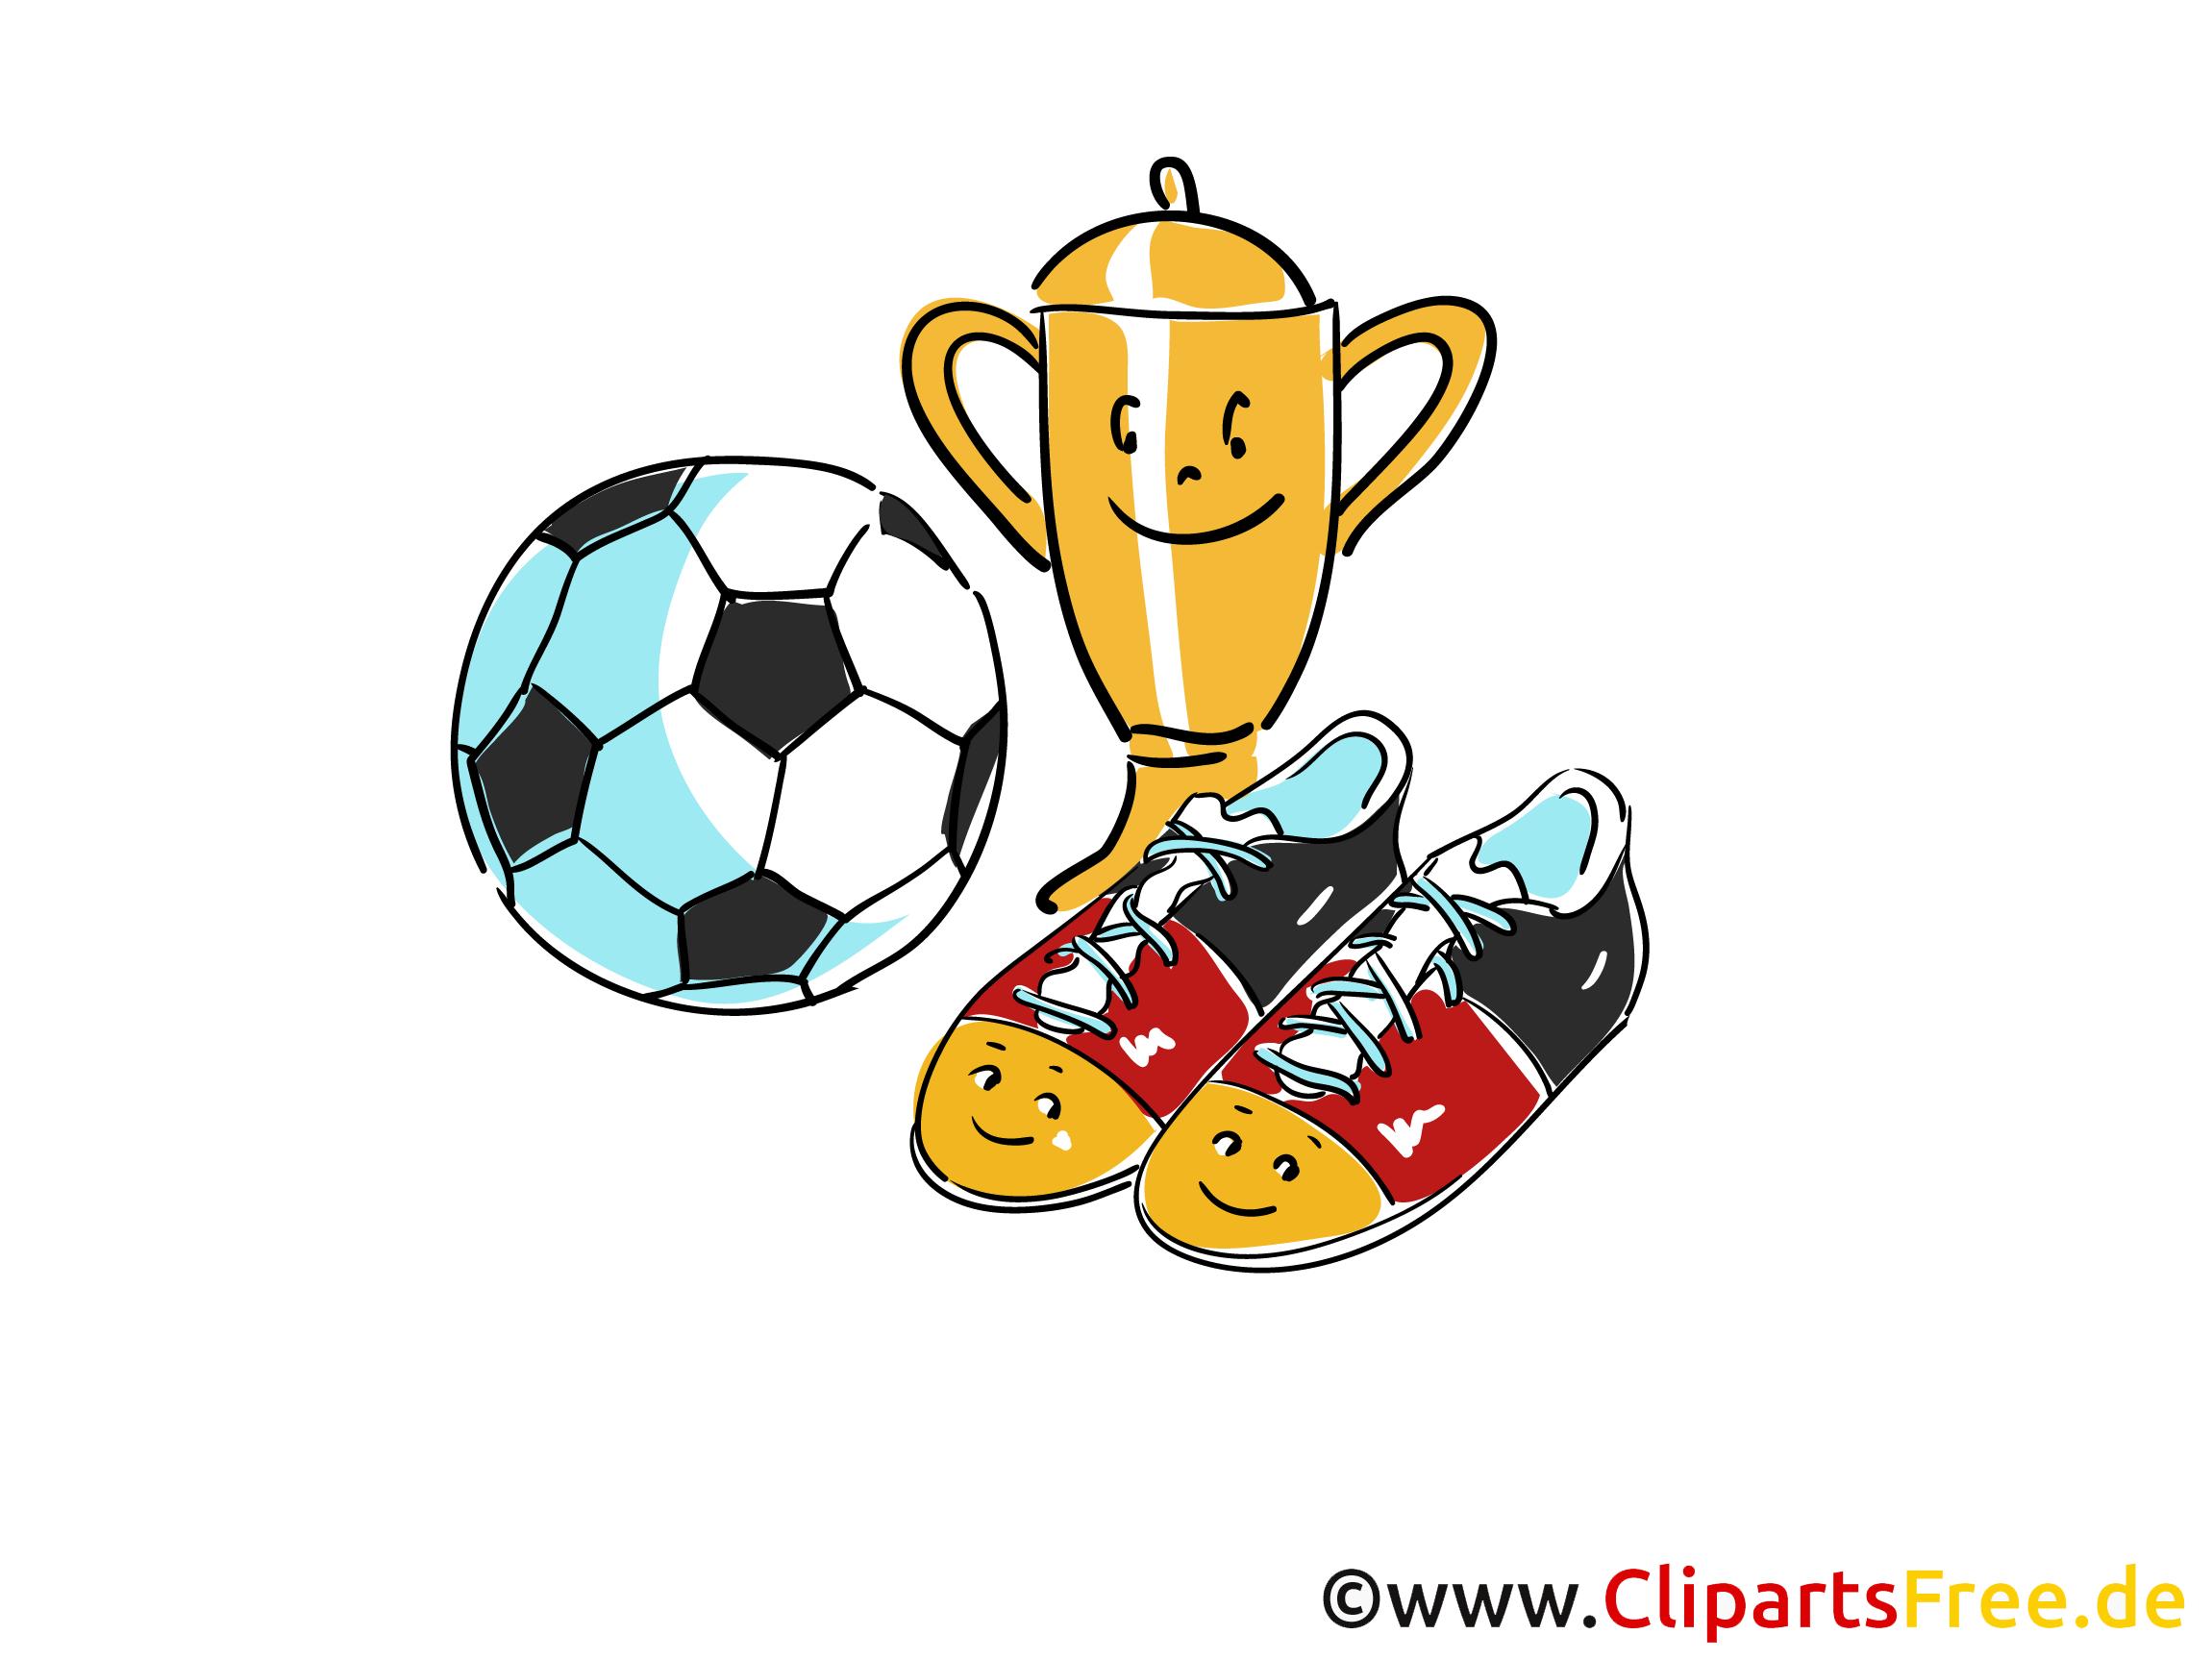 Pokal, Ball, Fussballschuhe Cliparts